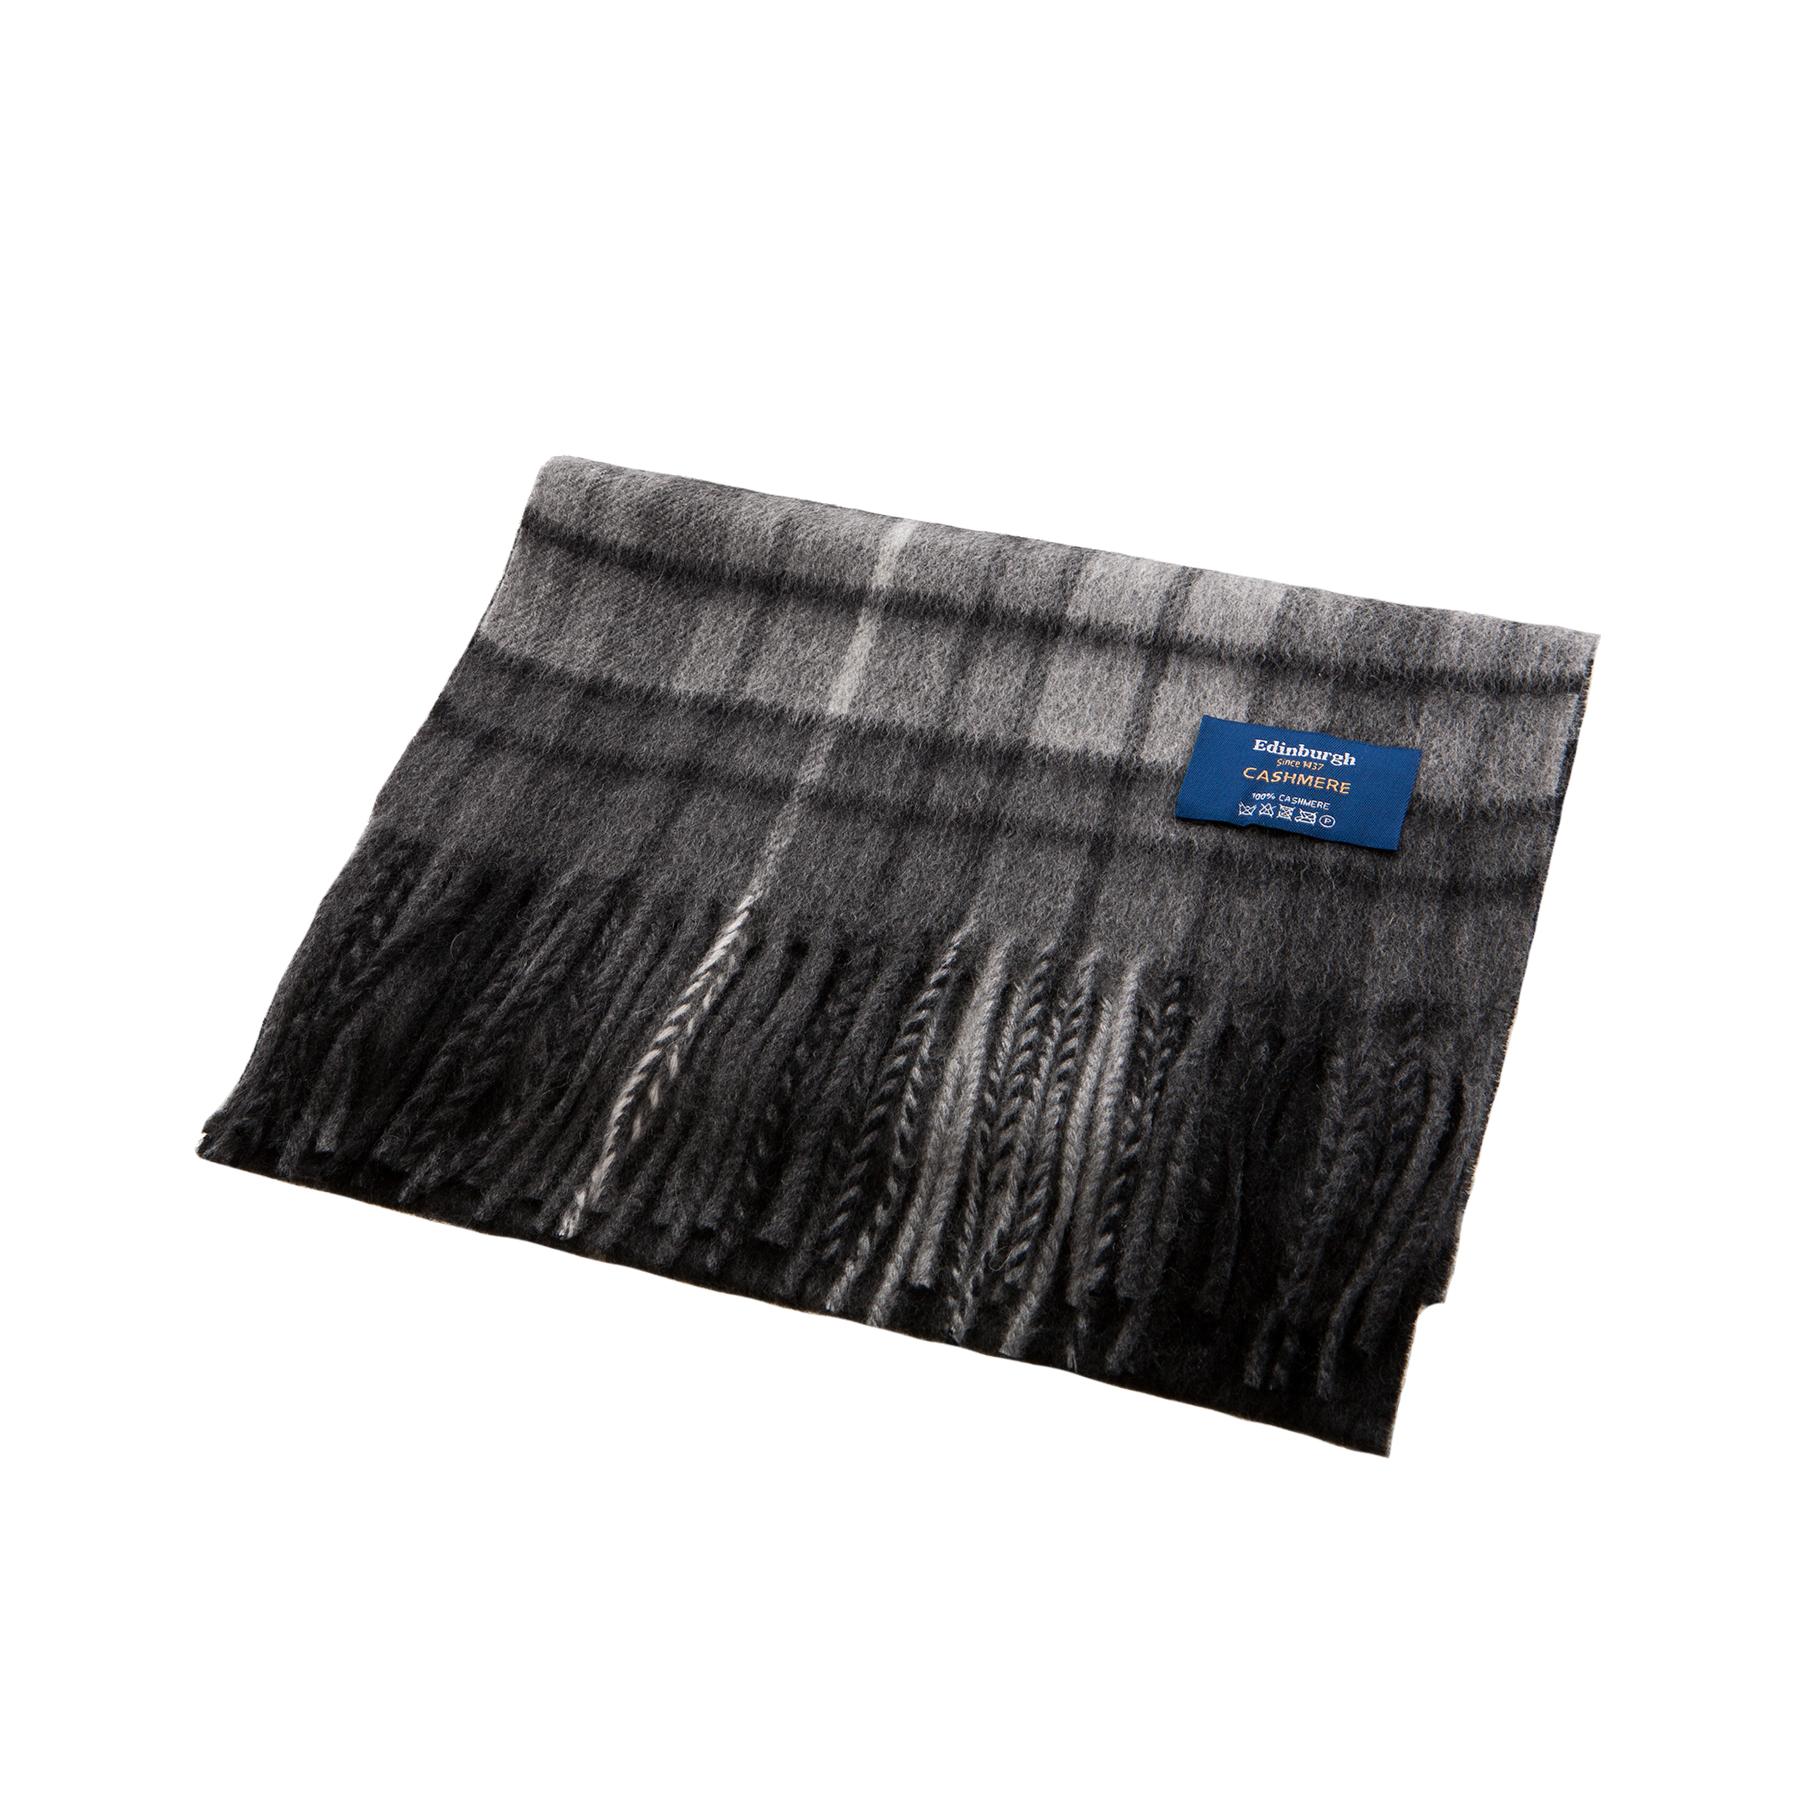 edinburgh 100 cashmere blue label scottish tartan luxury